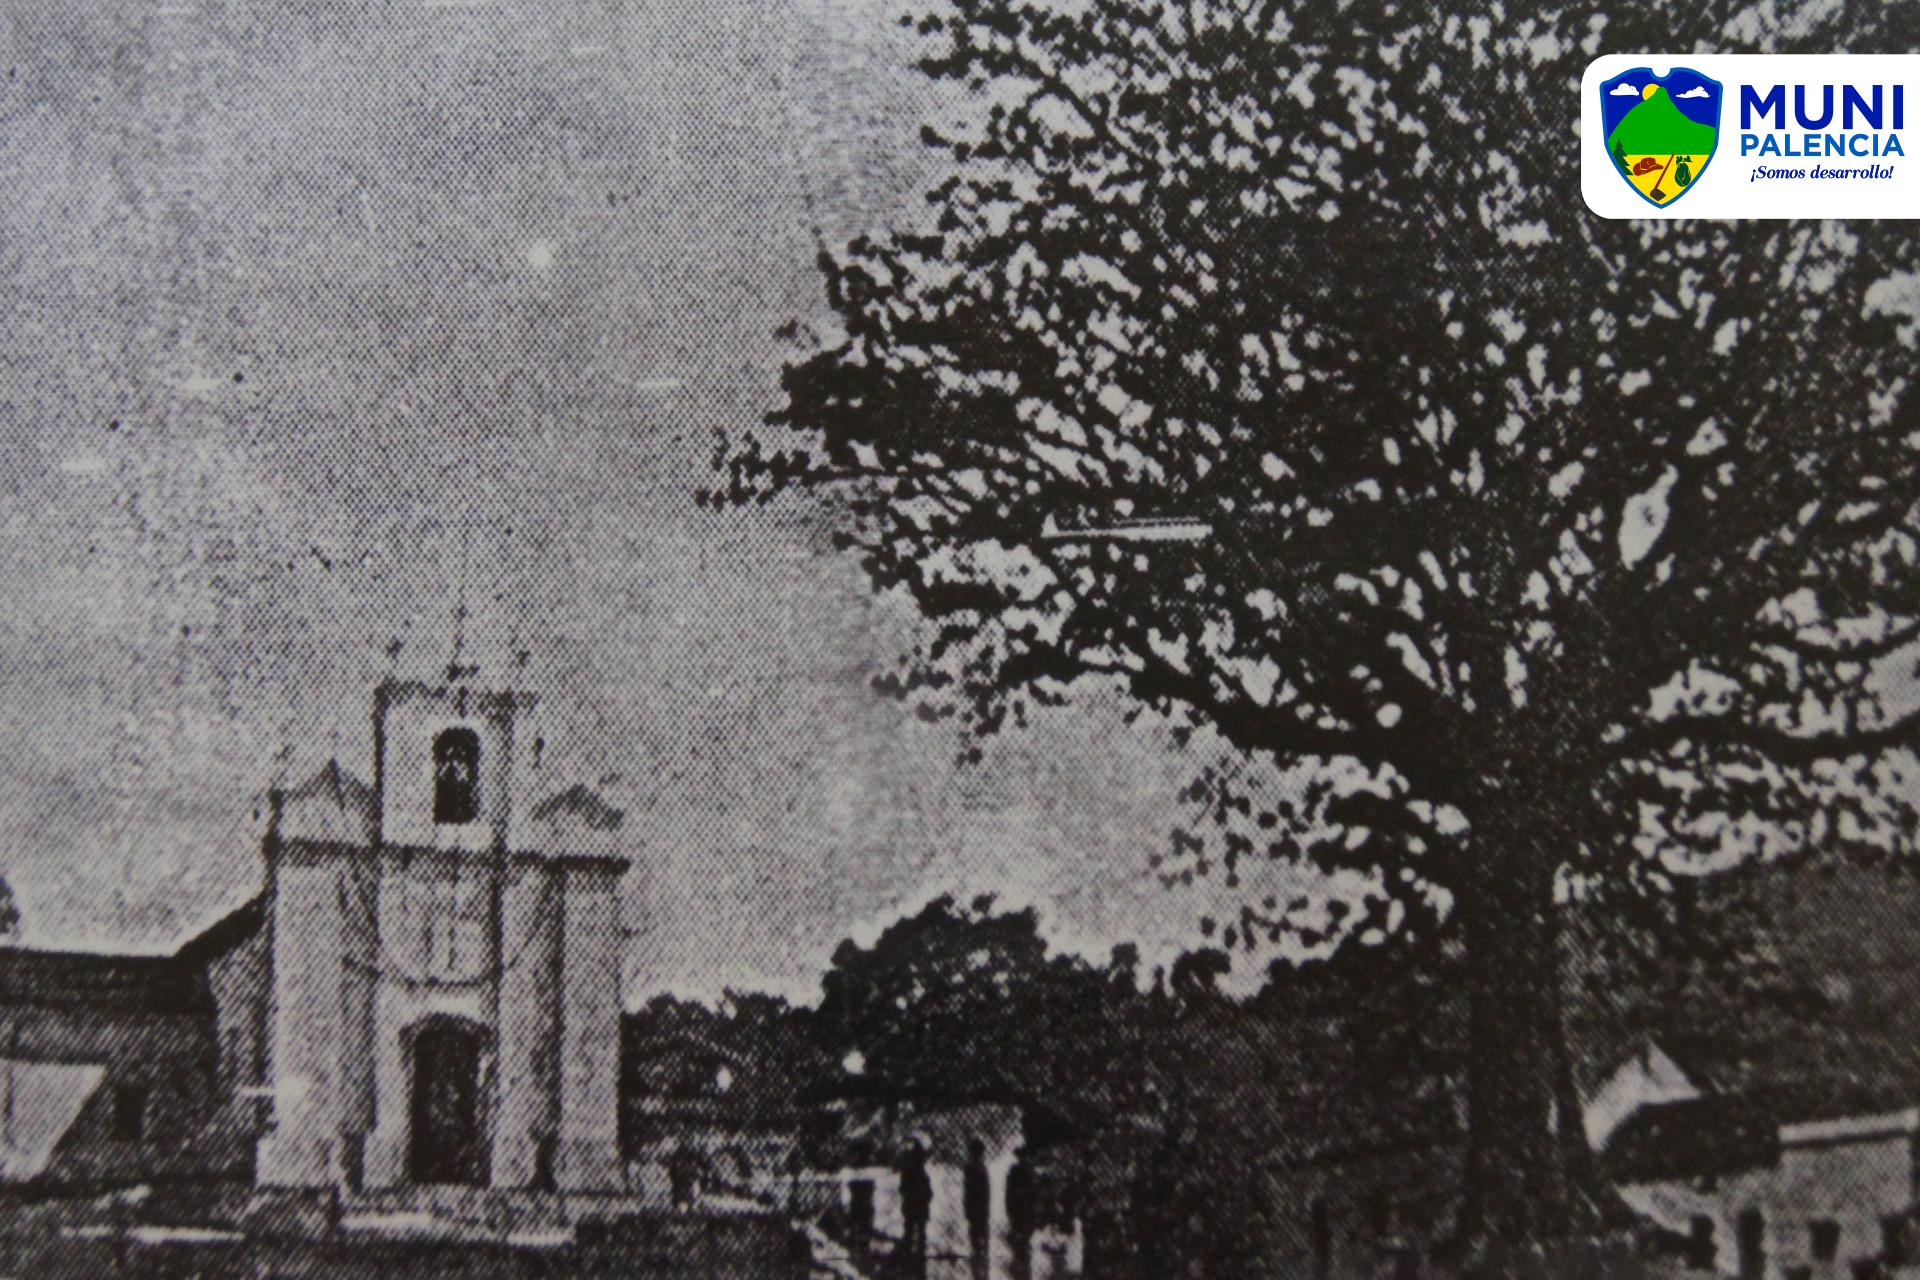 municipalidad de palencia, palencia, administracion municipal, municipalidad